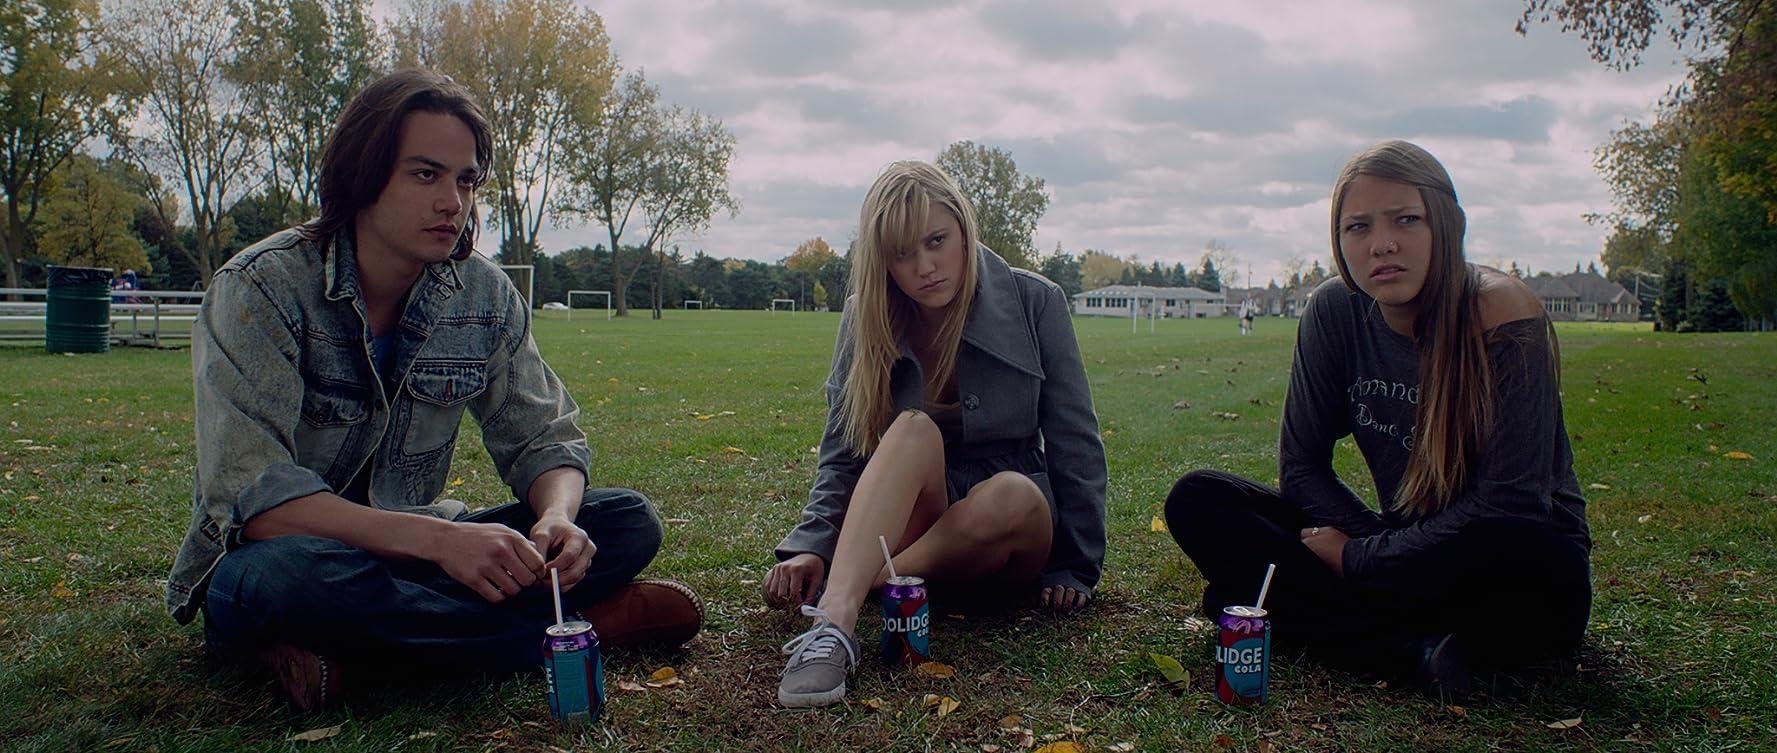 Maika Monroe, Lili Sepe, and Daniel Zovatto in It Follows (2014)